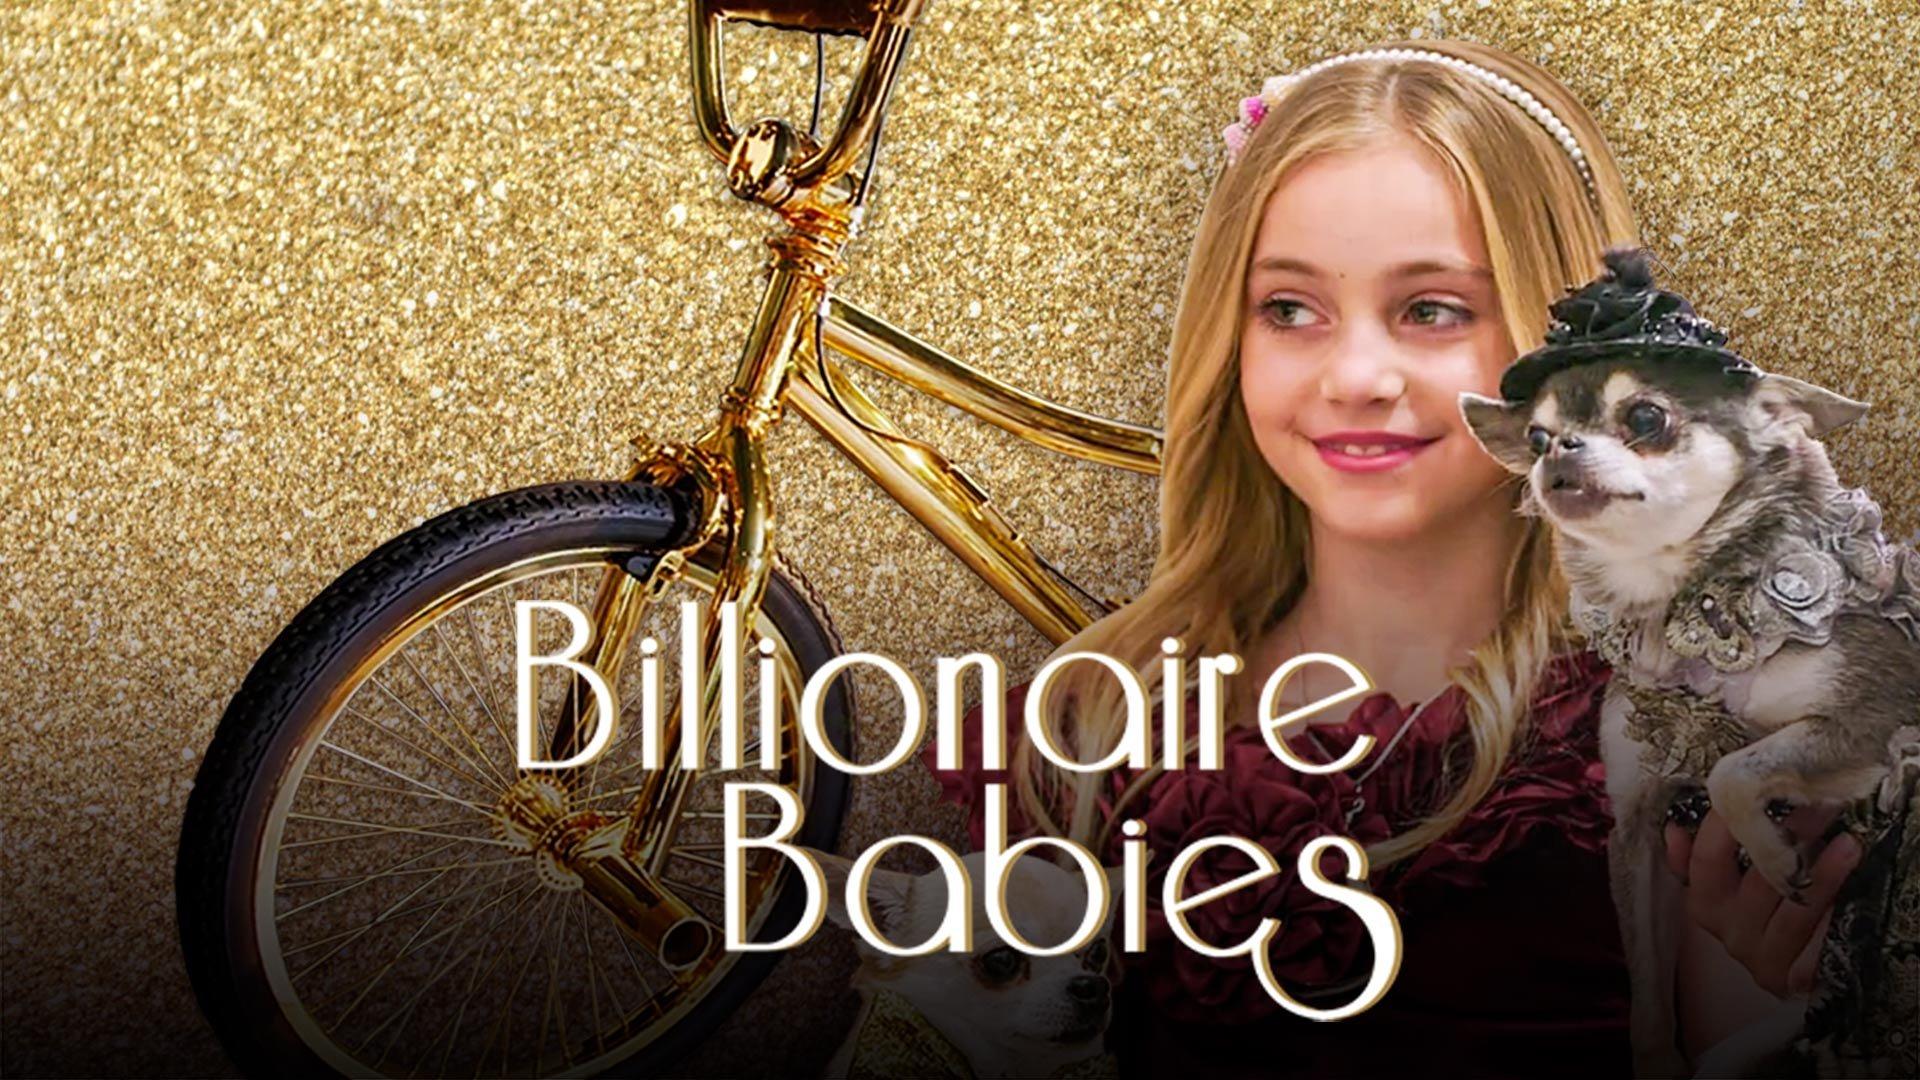 Billionaire Babies on BritBox UK